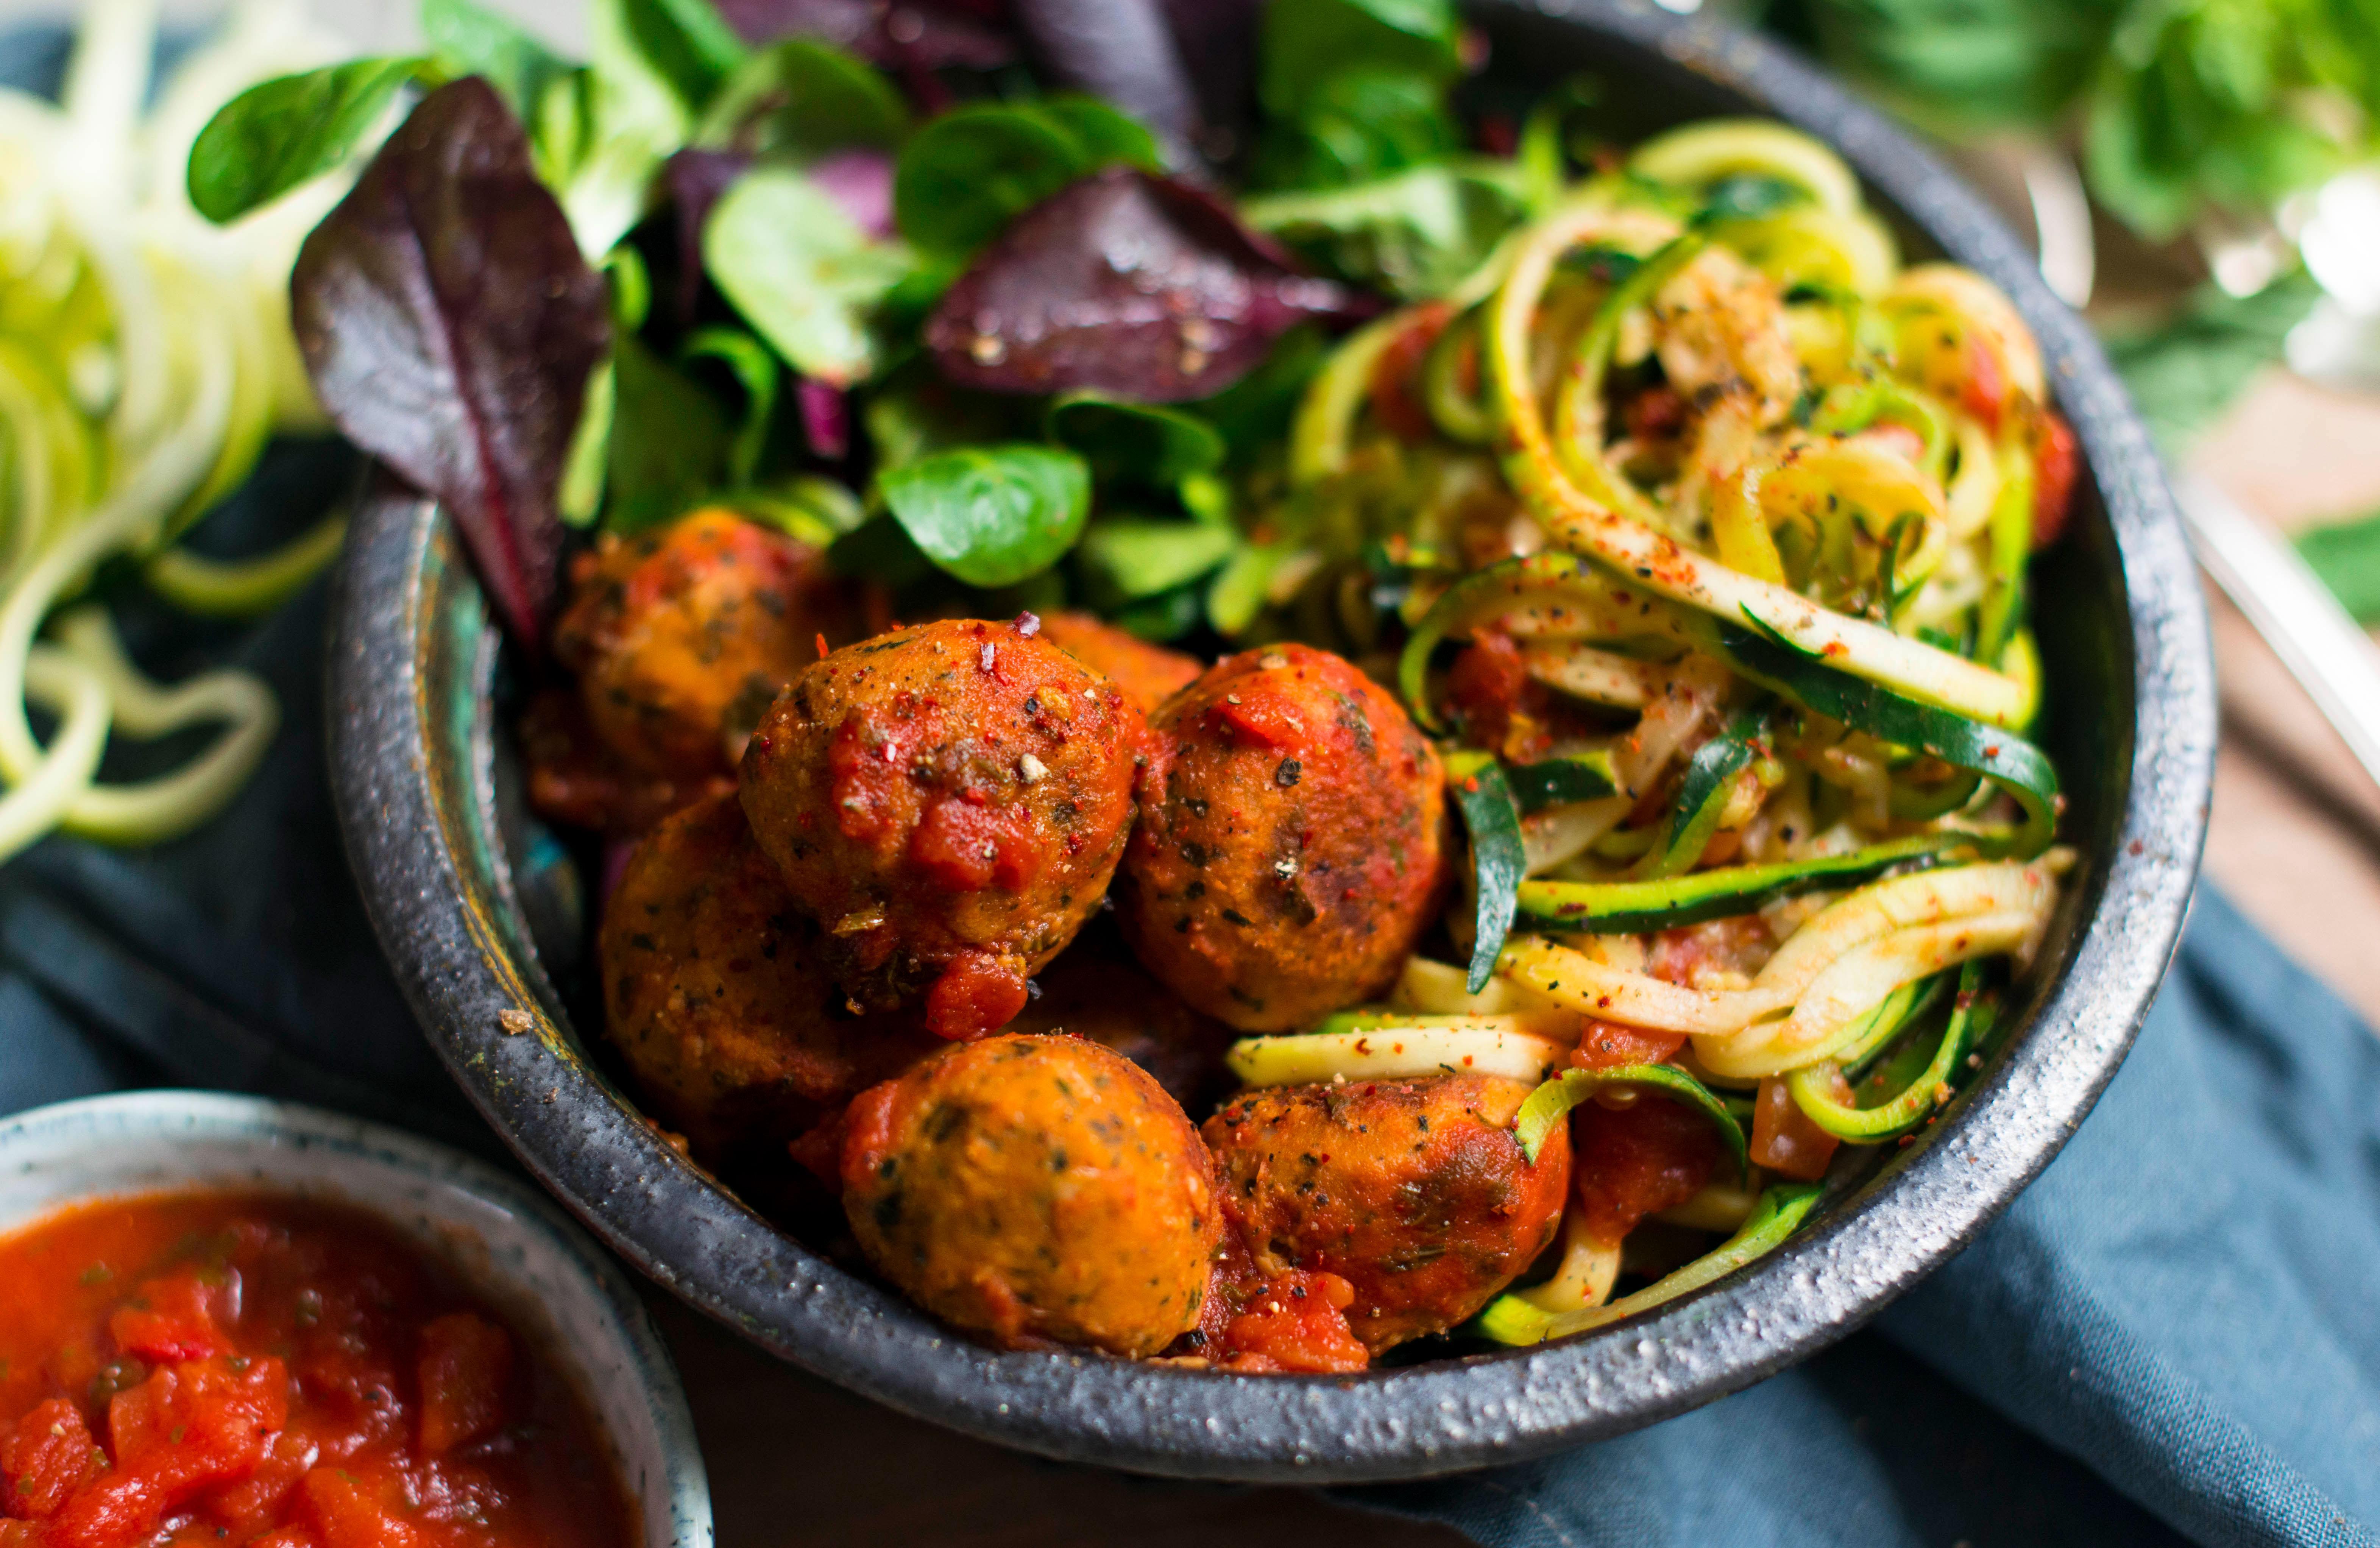 Courgetti-vegan-meat-balls-Florette-Lea-Lou-2